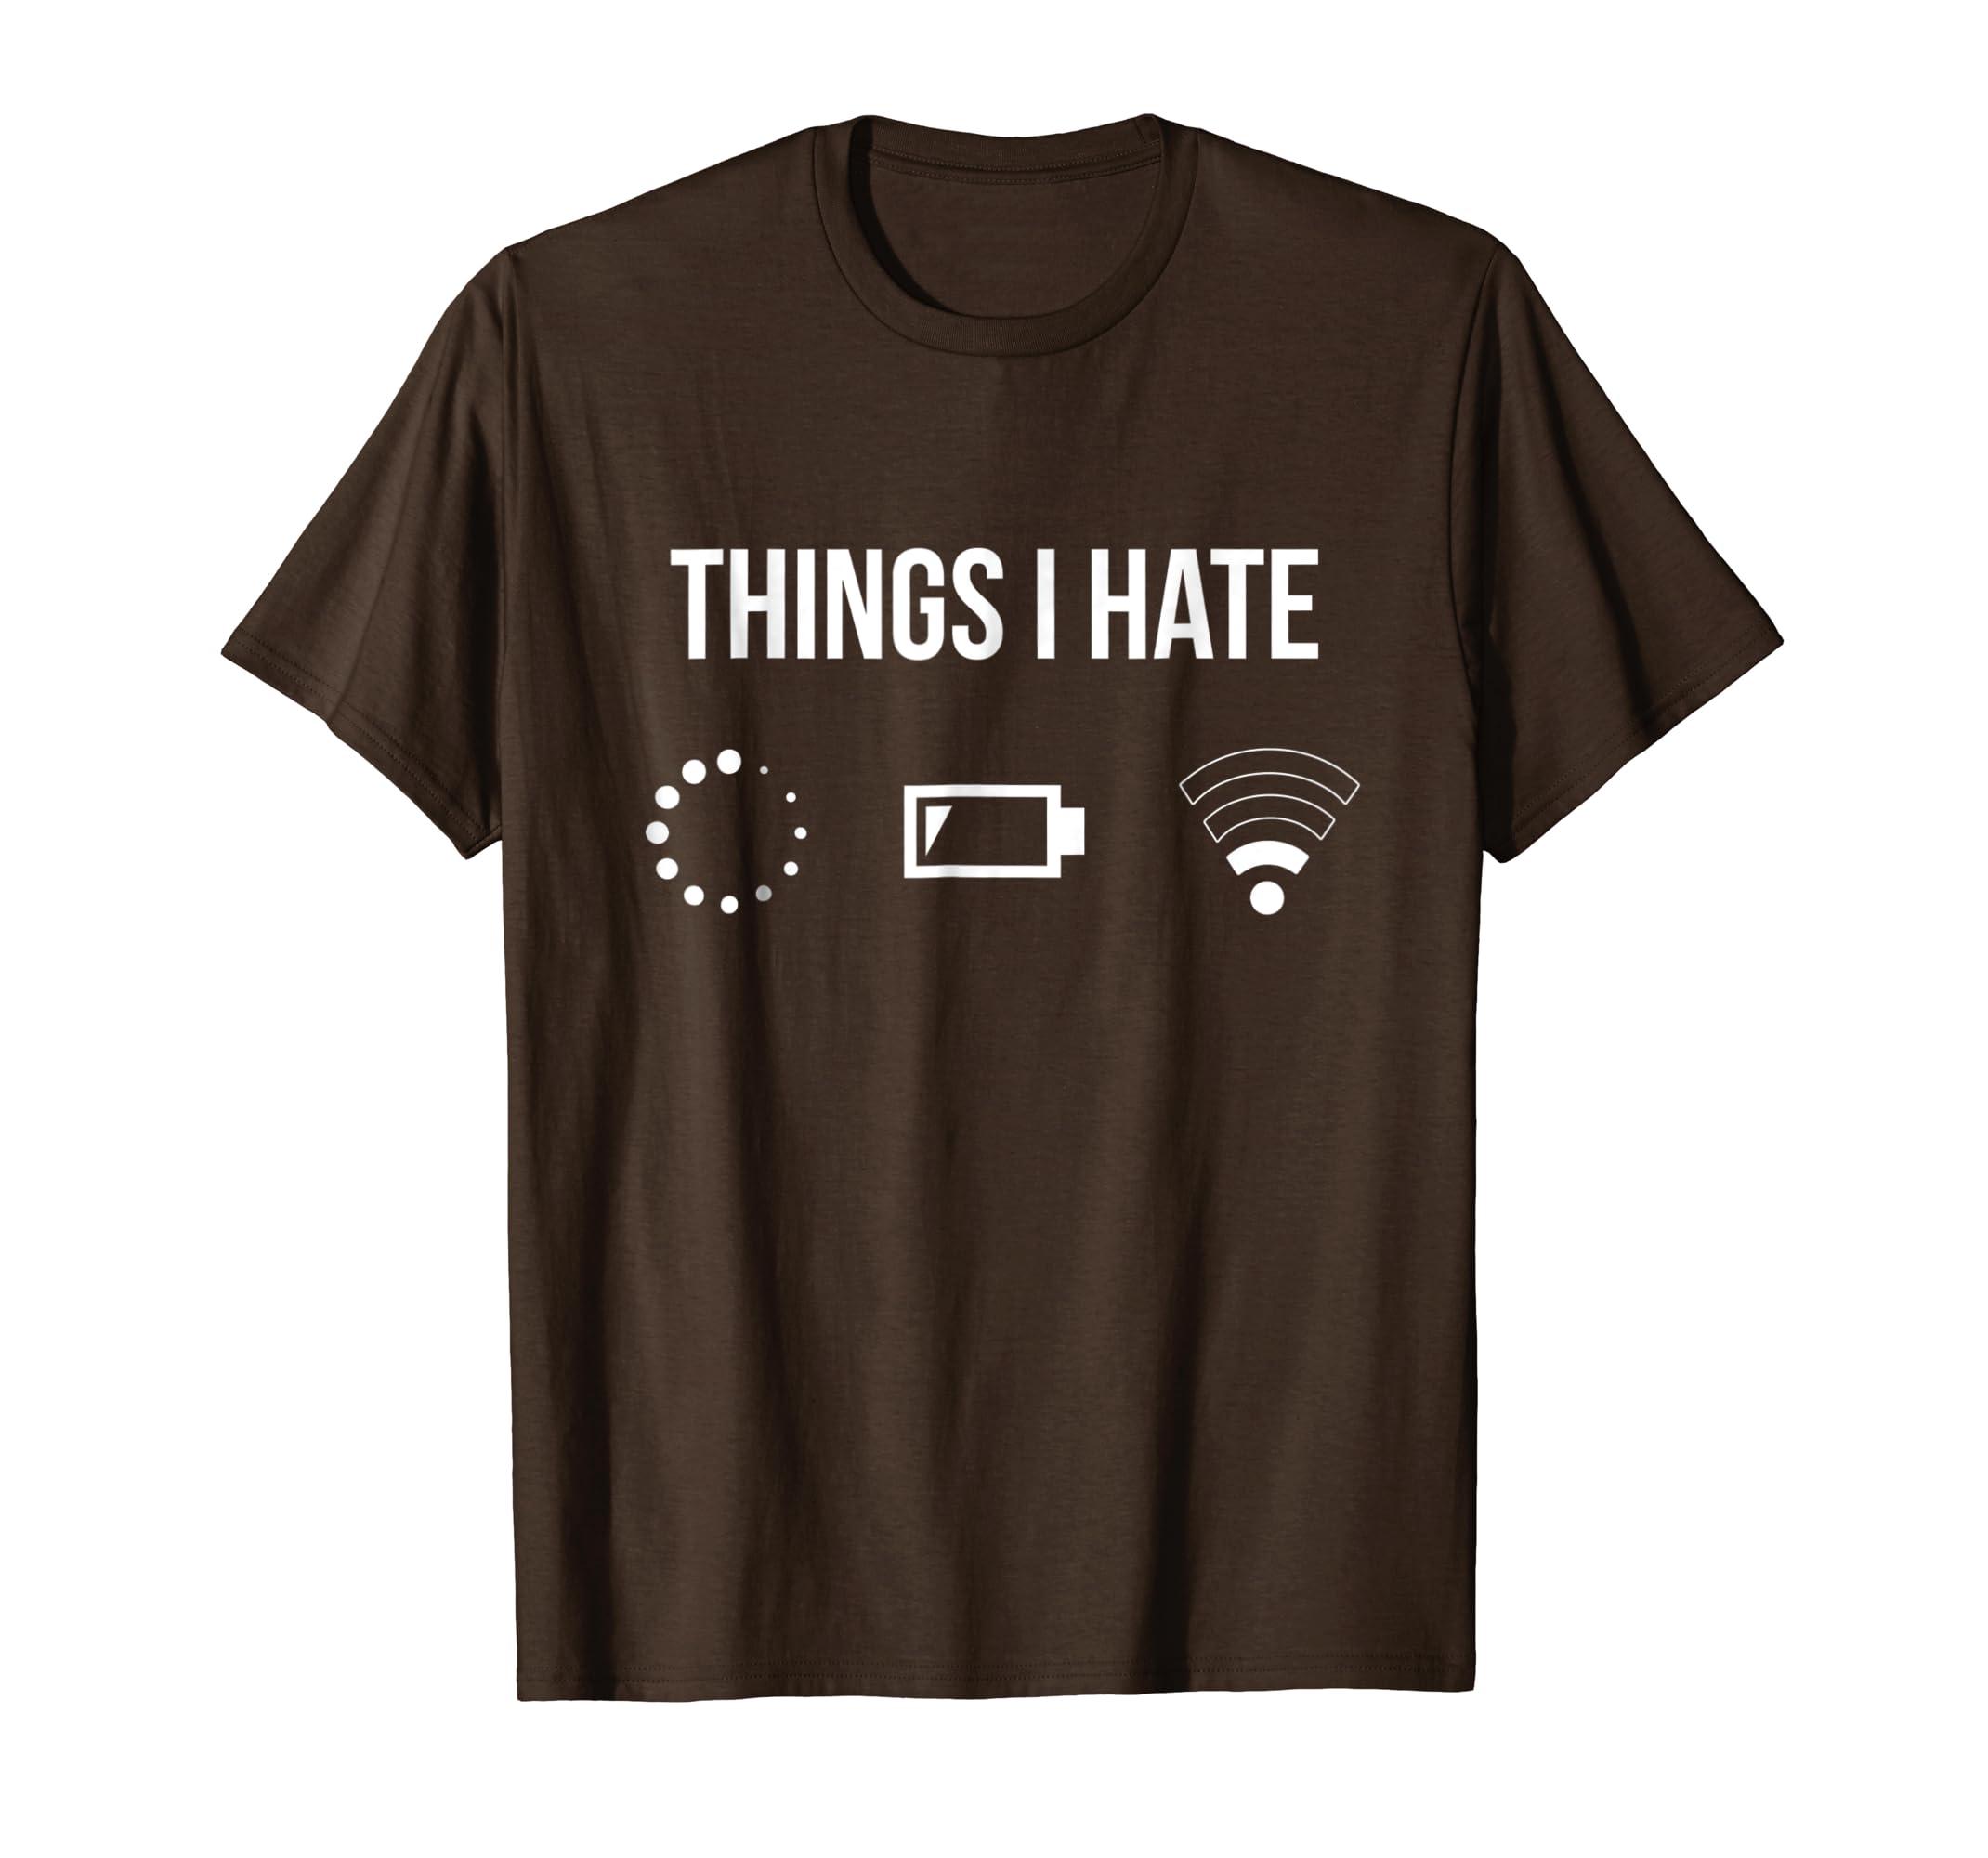 Things I Hate TShirt Programmer Gamer Fun Shirt Gift Idea-Yolotee